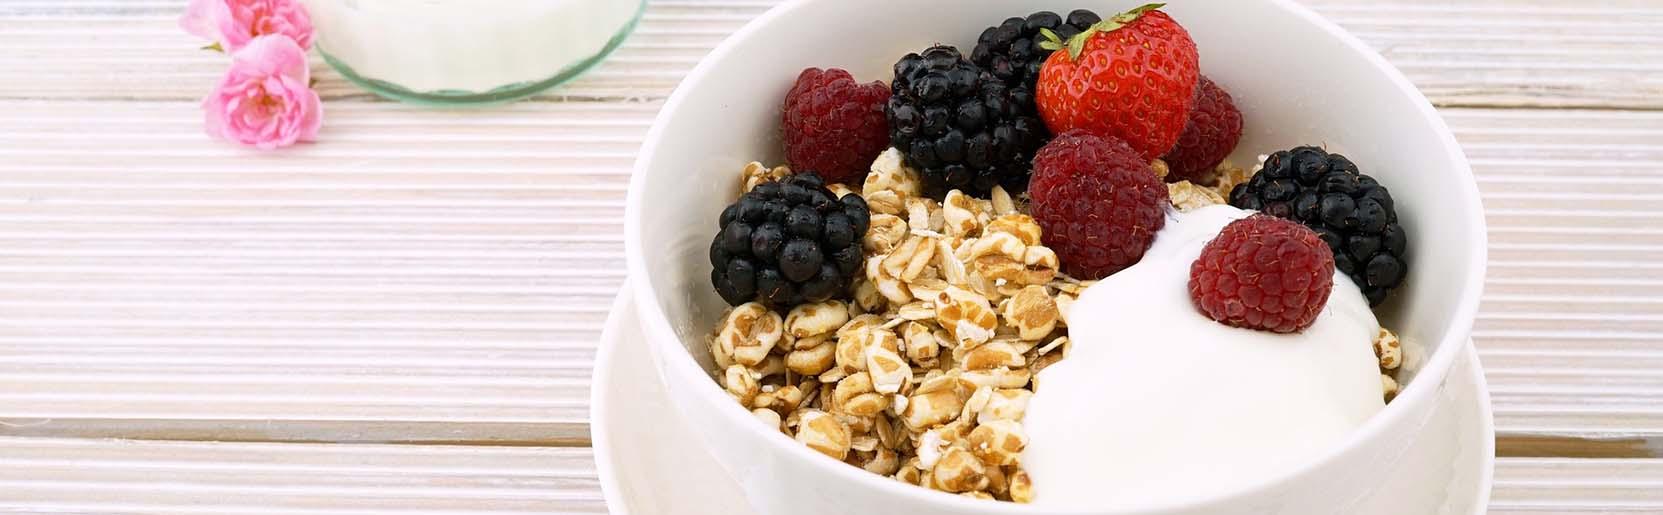 Alimentos esenciales para adelgazar